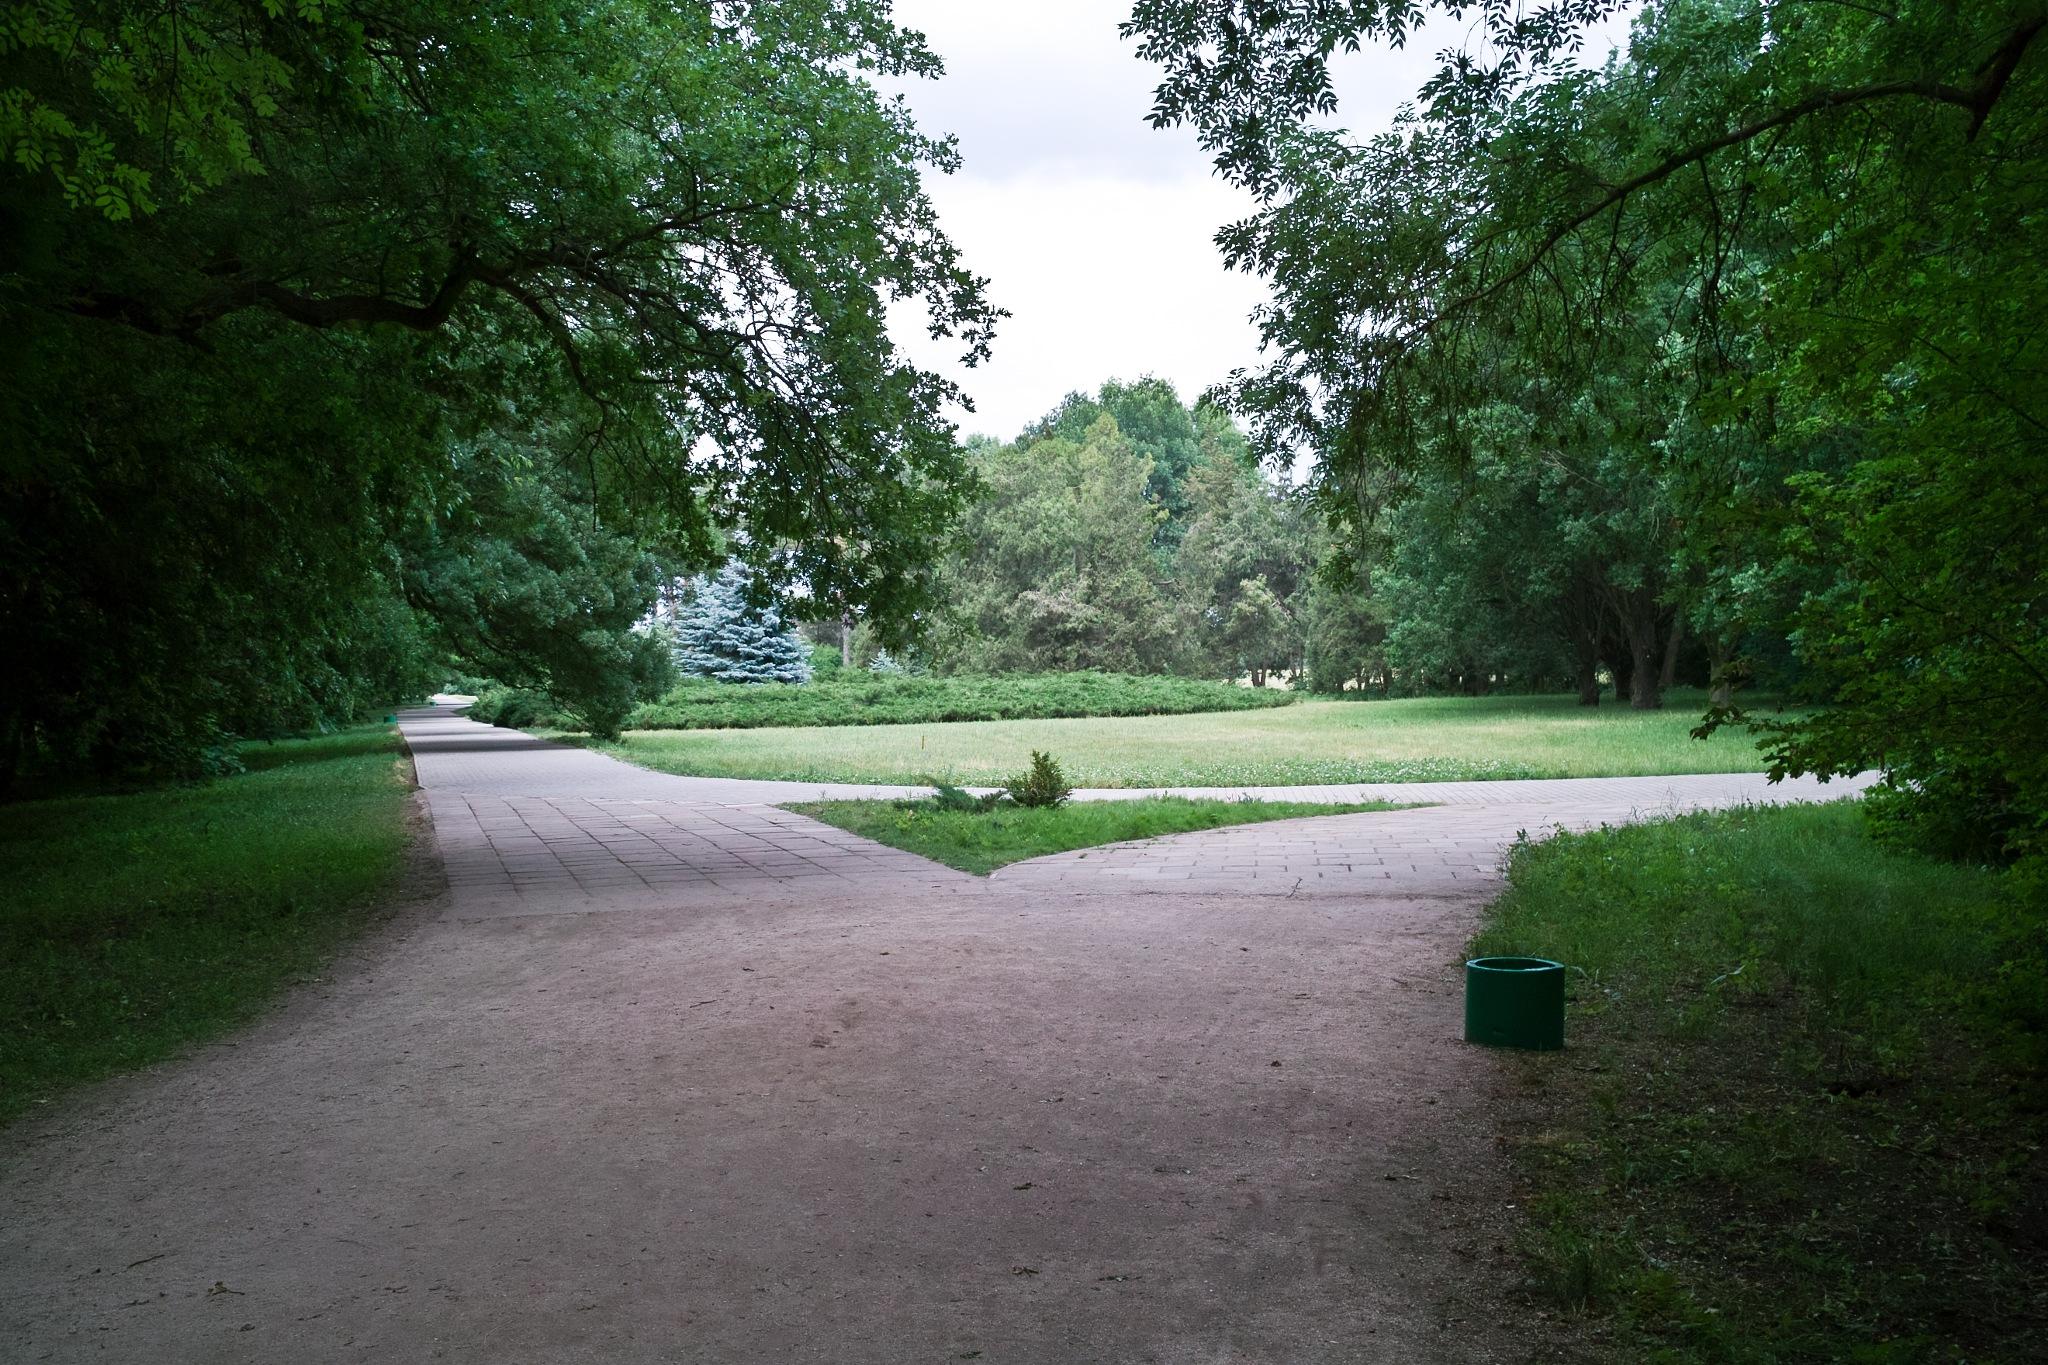 Развилка в парке by DimaShevchuk